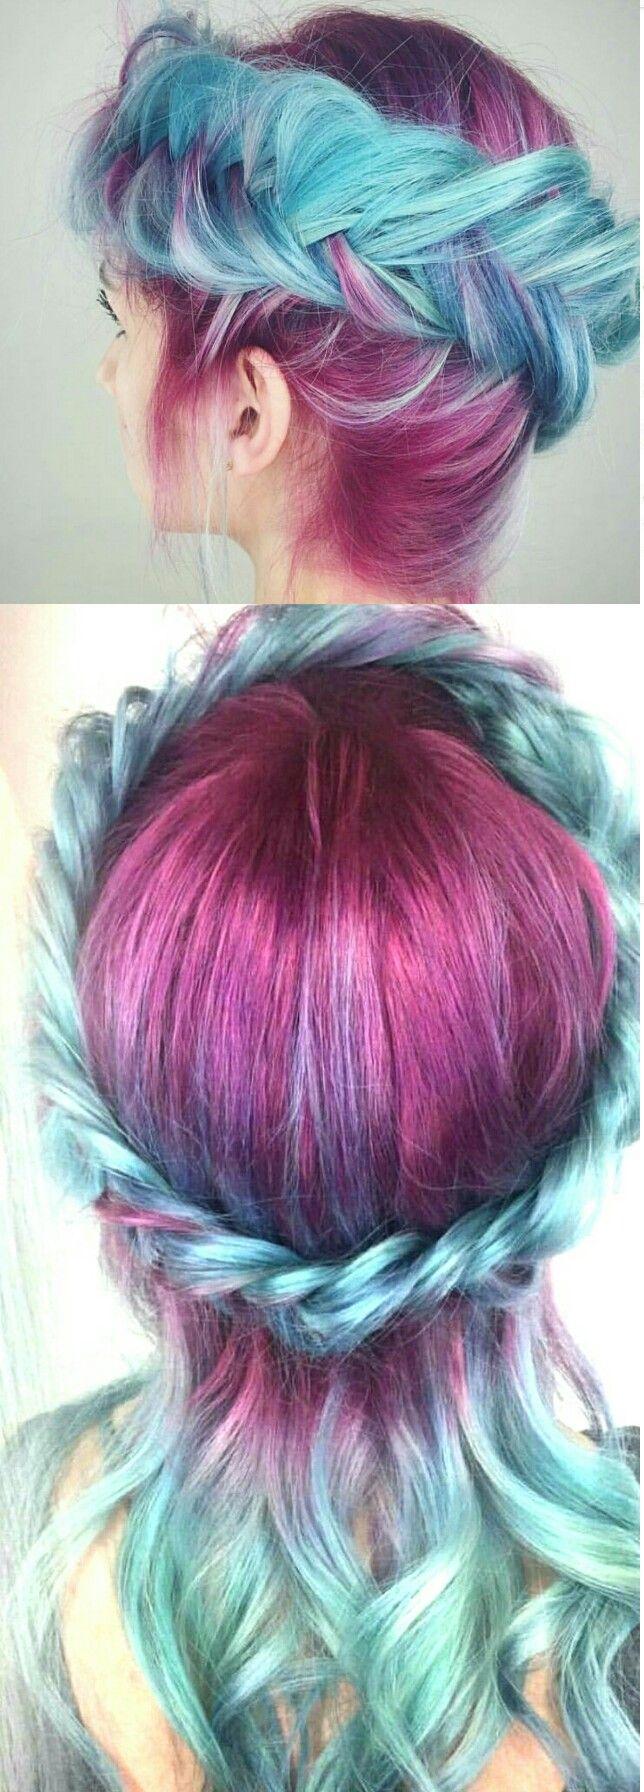 best p a s t e l l o c k s images on pinterest hairstyles